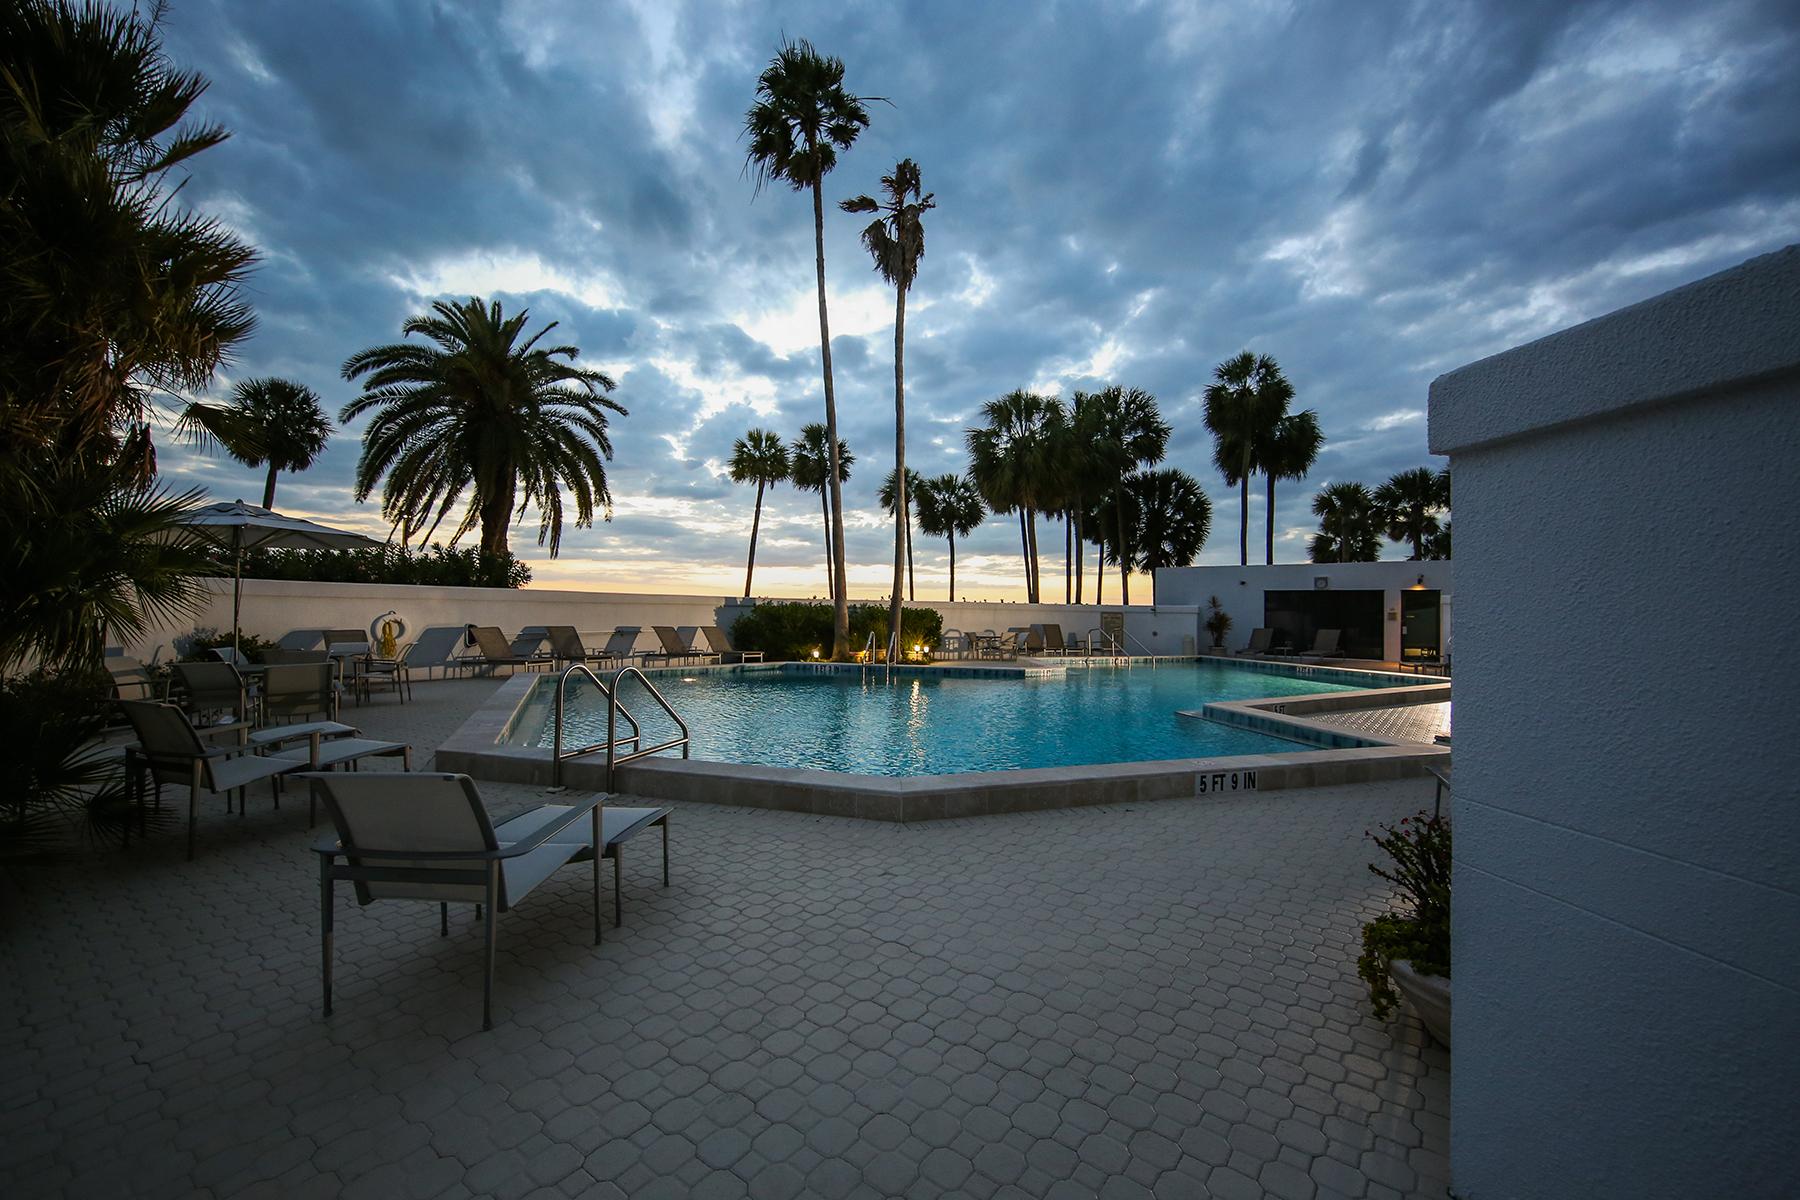 Condominium for Sale at CONDO ON THE BAY 988 Blvd Of The Arts 1514 Sarasota, Florida, 34236 United States